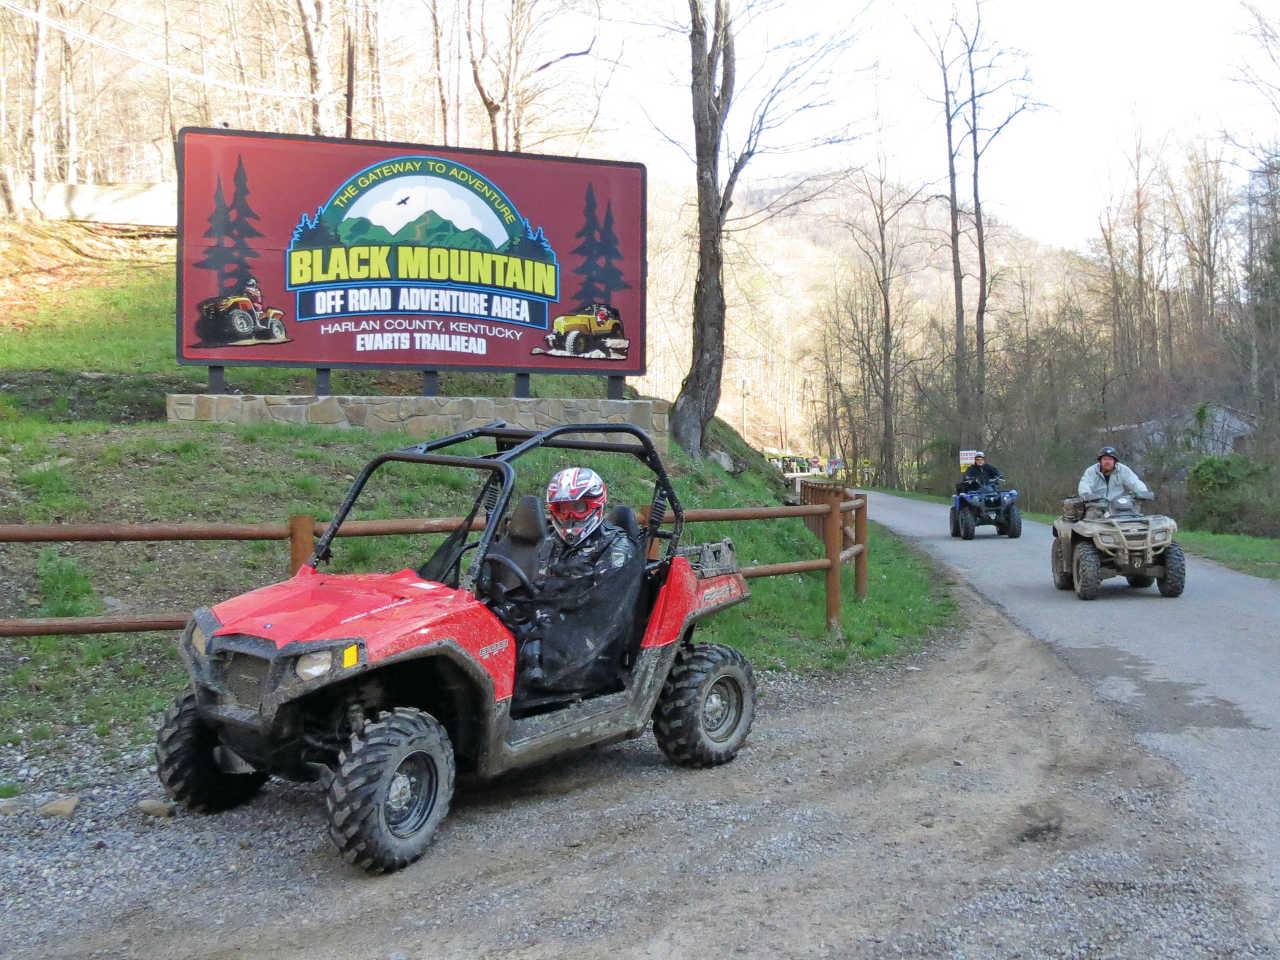 location.2013.harlan-county-kentucky.black-mountain-off-road-adventure-area-sign.JPG